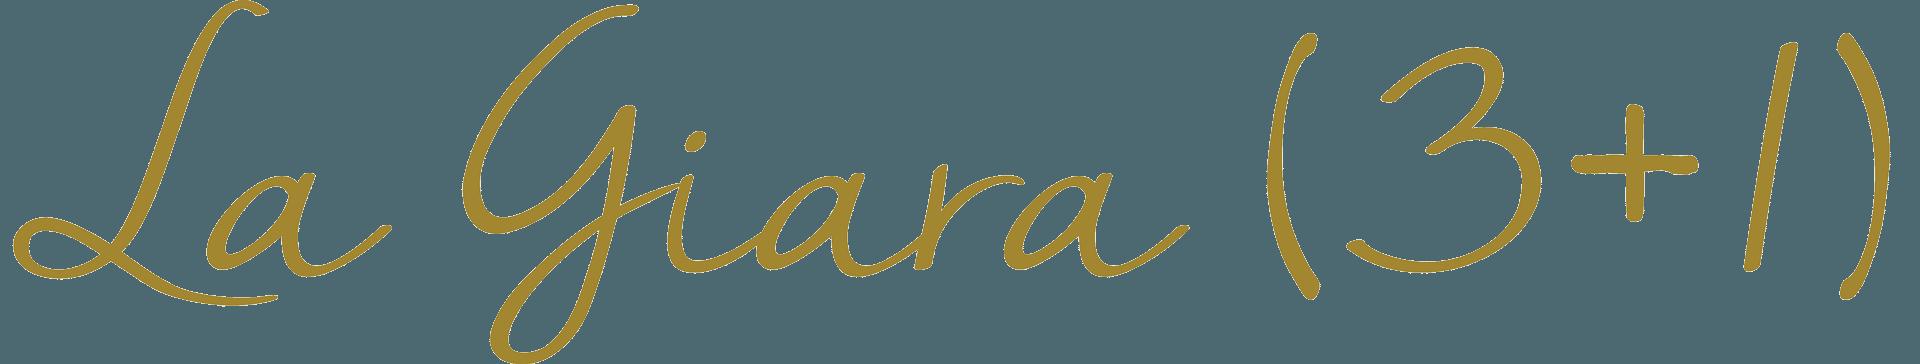 lagiara-titolo